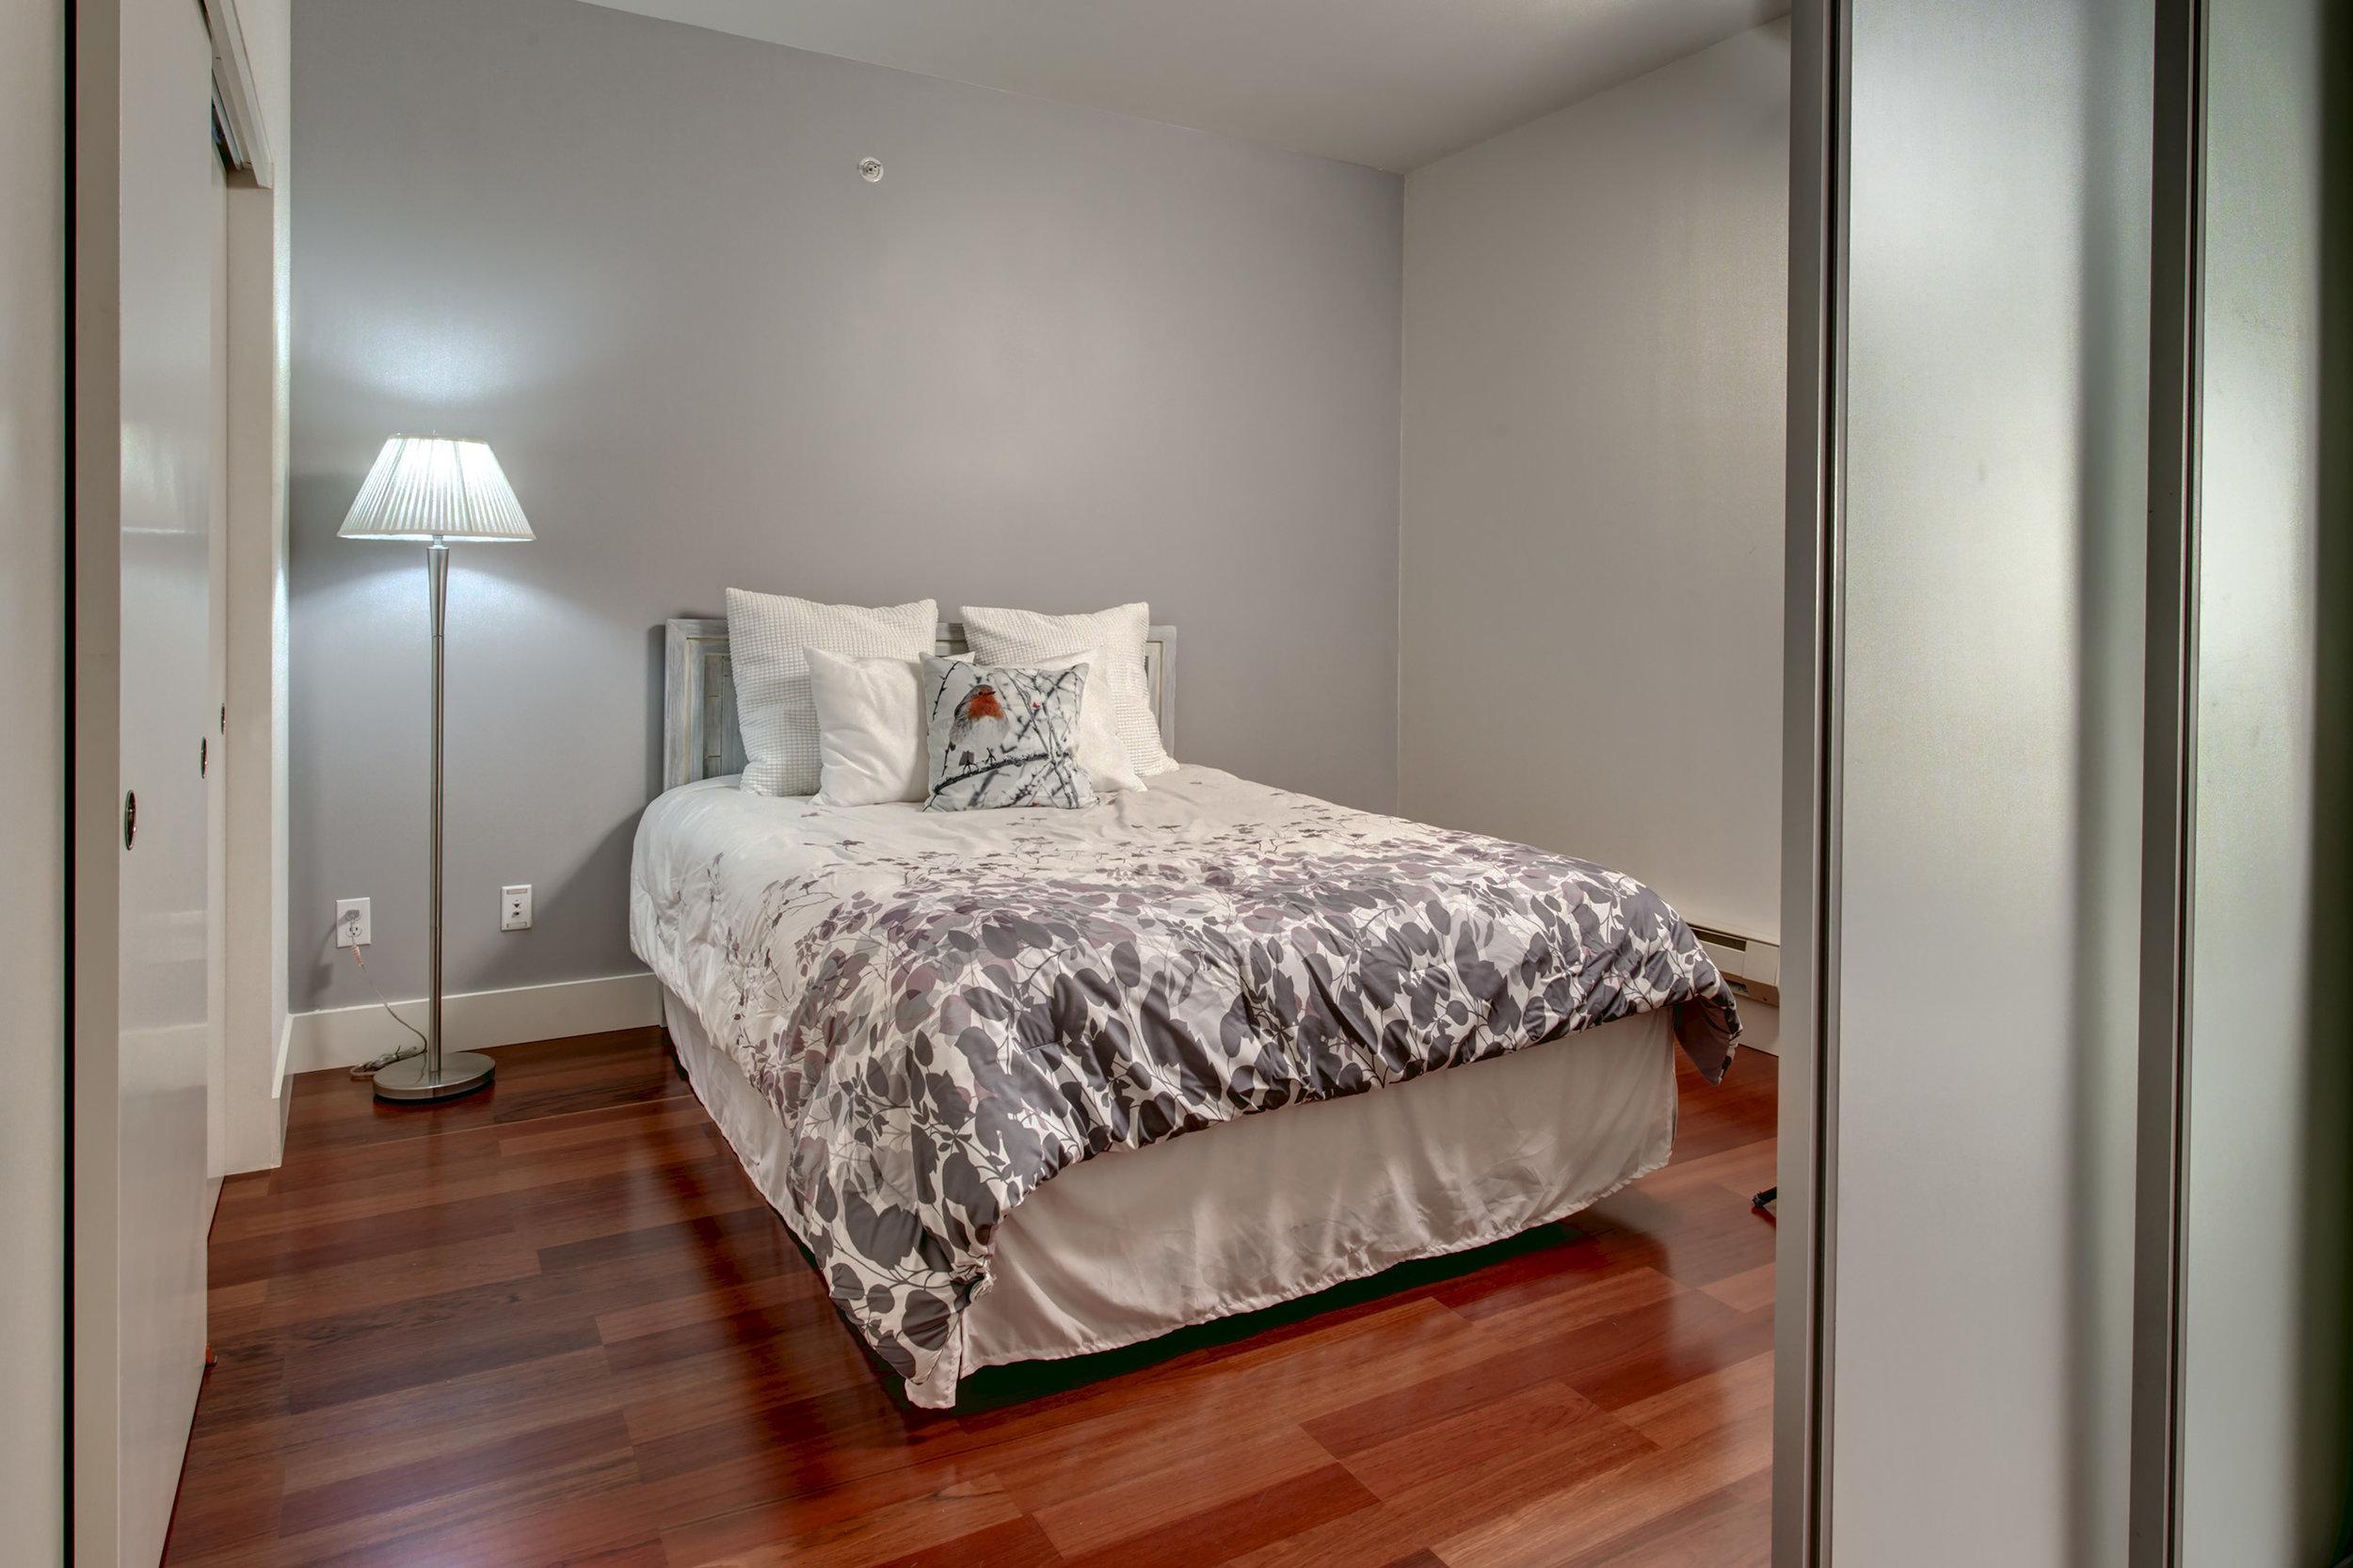 What a spacious bedroom. Sweet dreams.